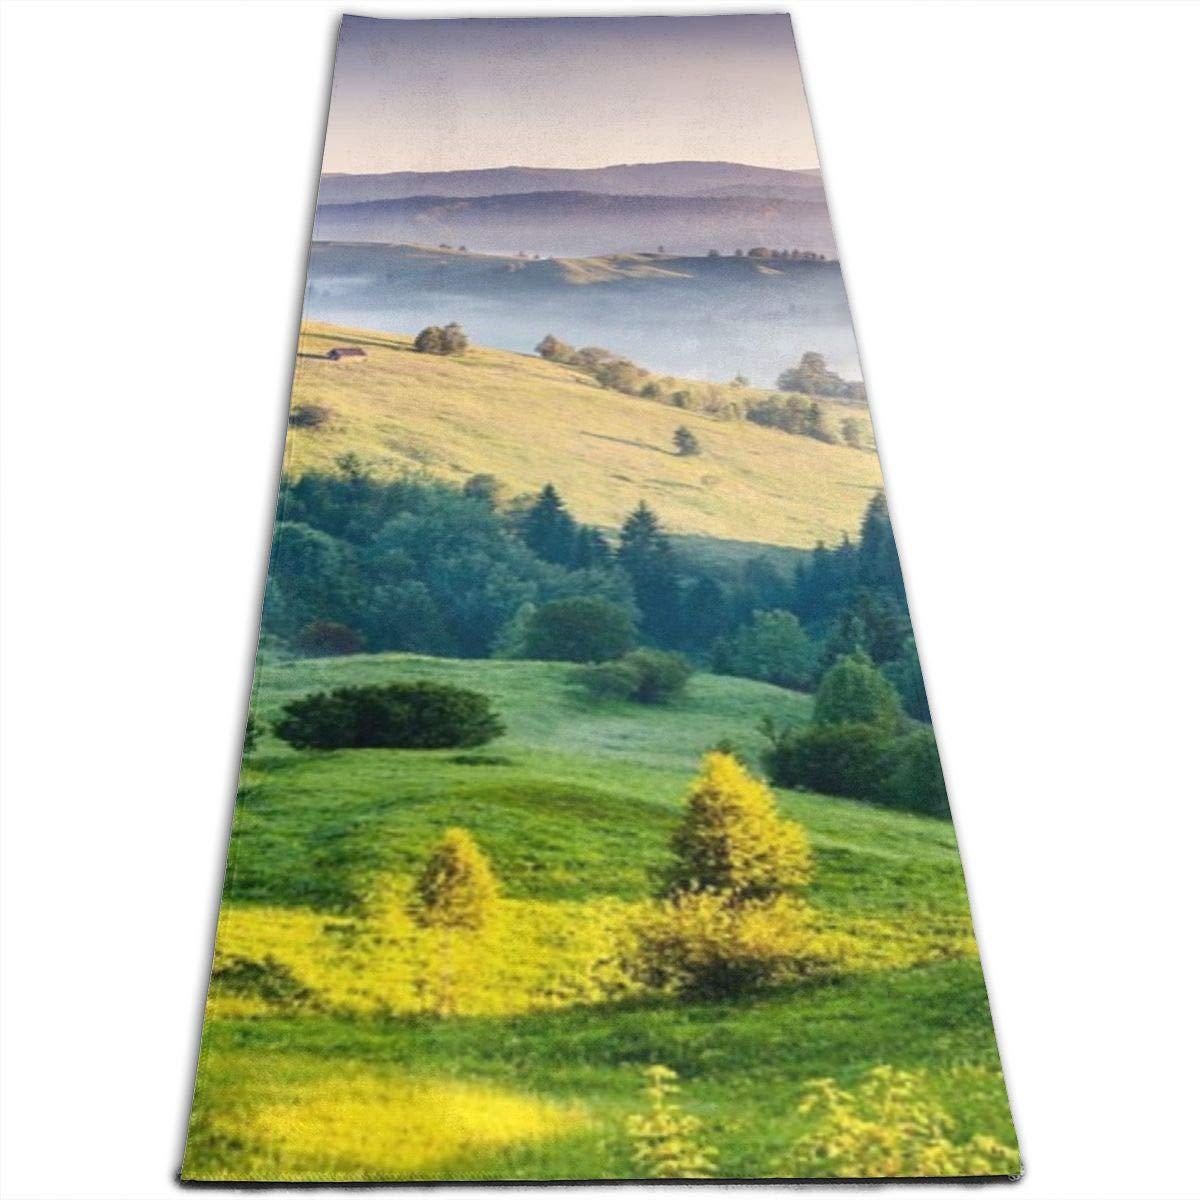 Amazon.com: Hills India Nature Yoga Design Foldable Exercise ...